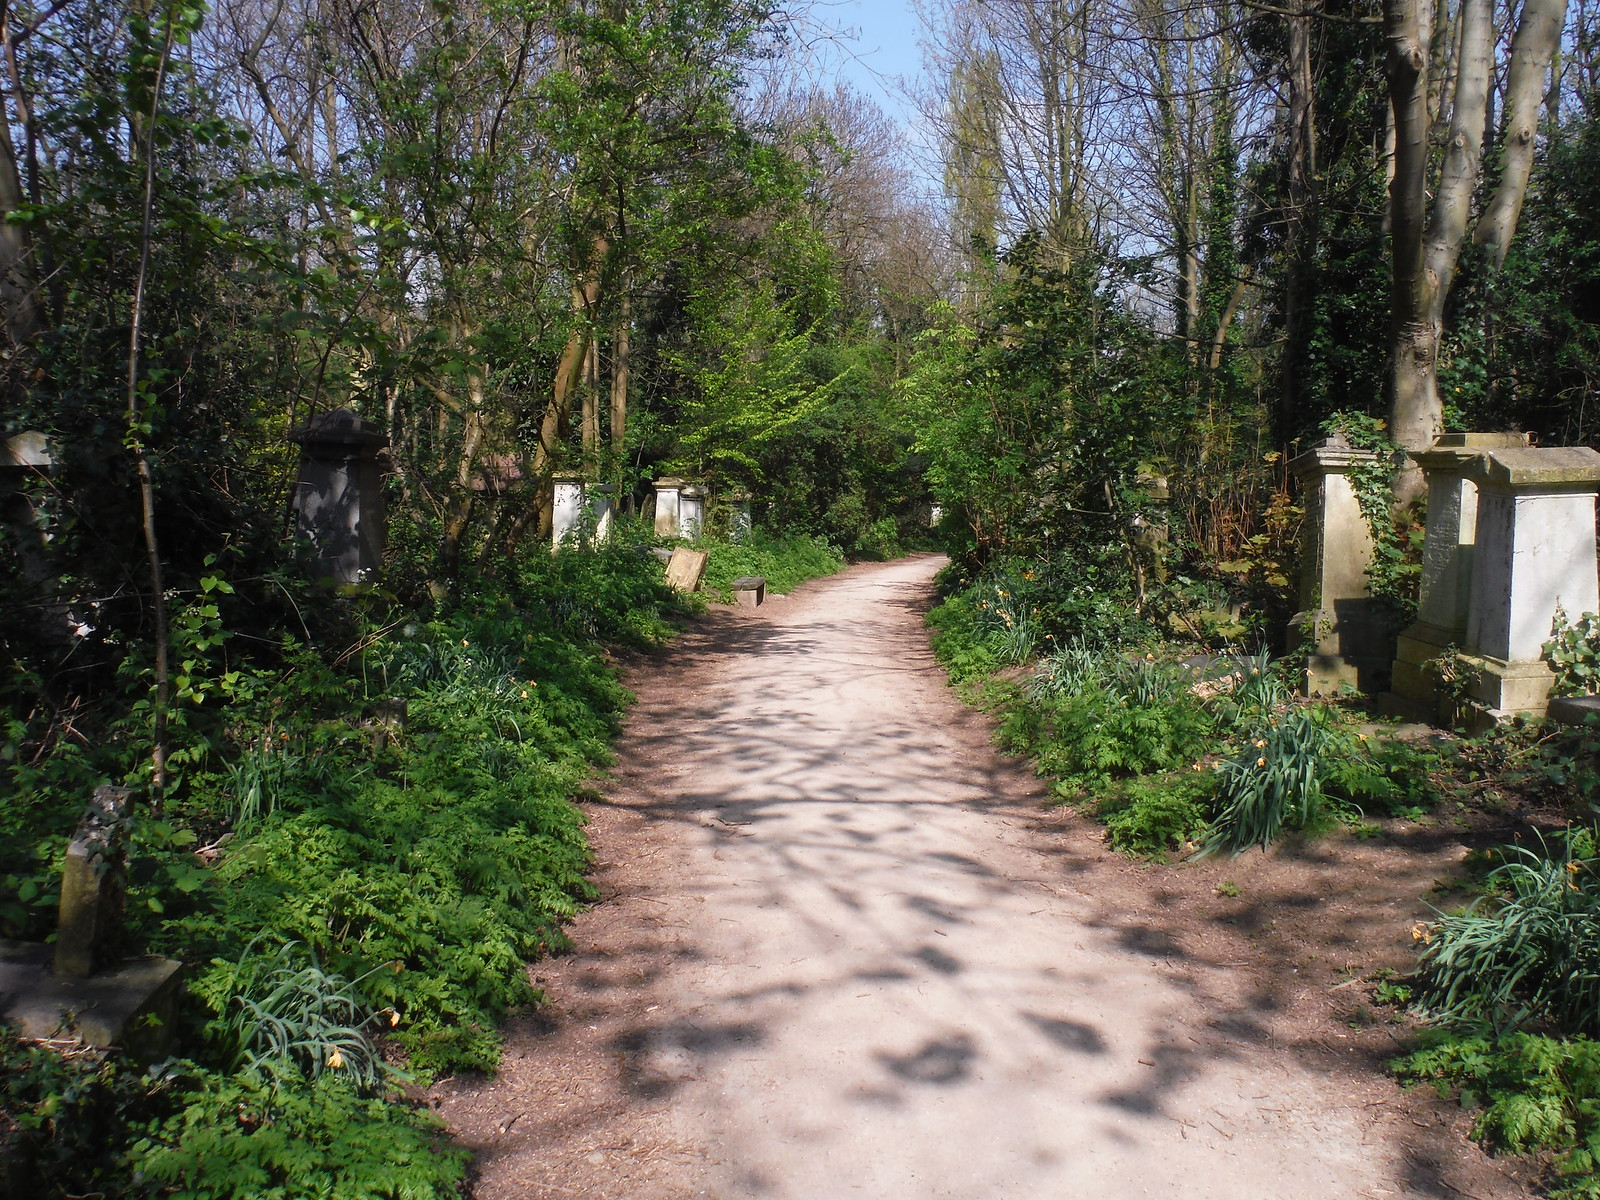 Abney Park Cemetery (IV) SWC Short Walk 26 - Woodberry Wetlands (Stoke Newington Reservoirs)